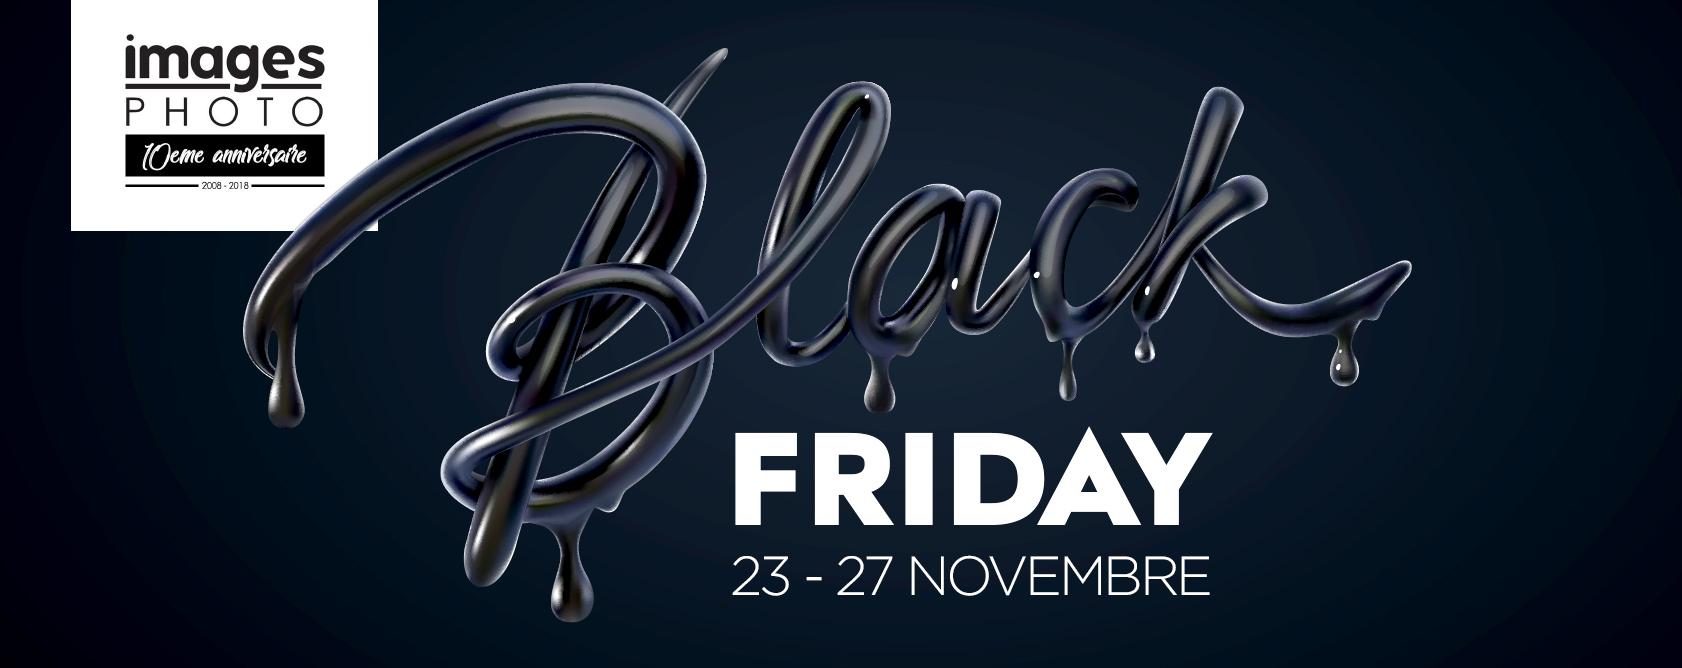 Black Friday 27 novembre